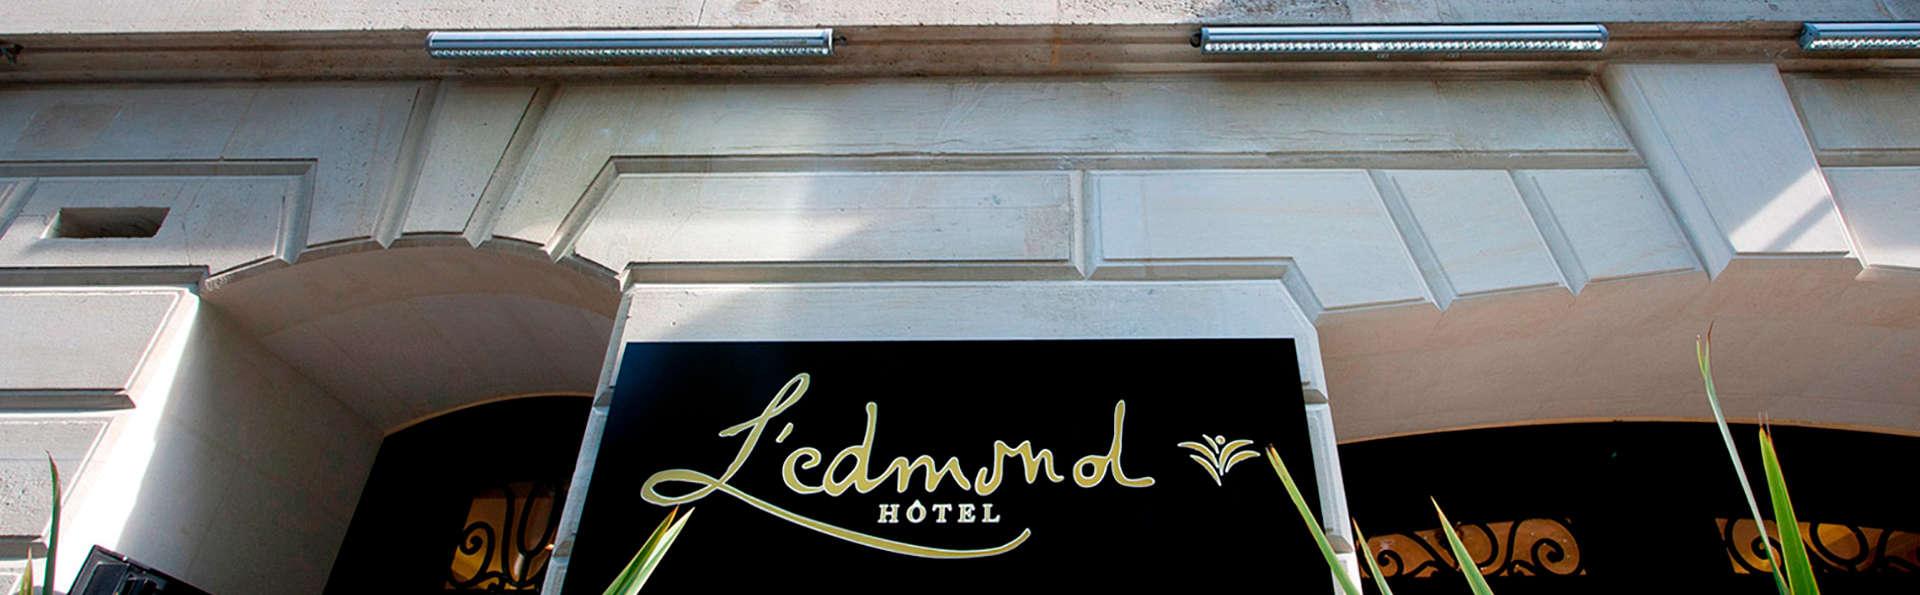 L'Edmond Hôtel - edit_front1.jpg